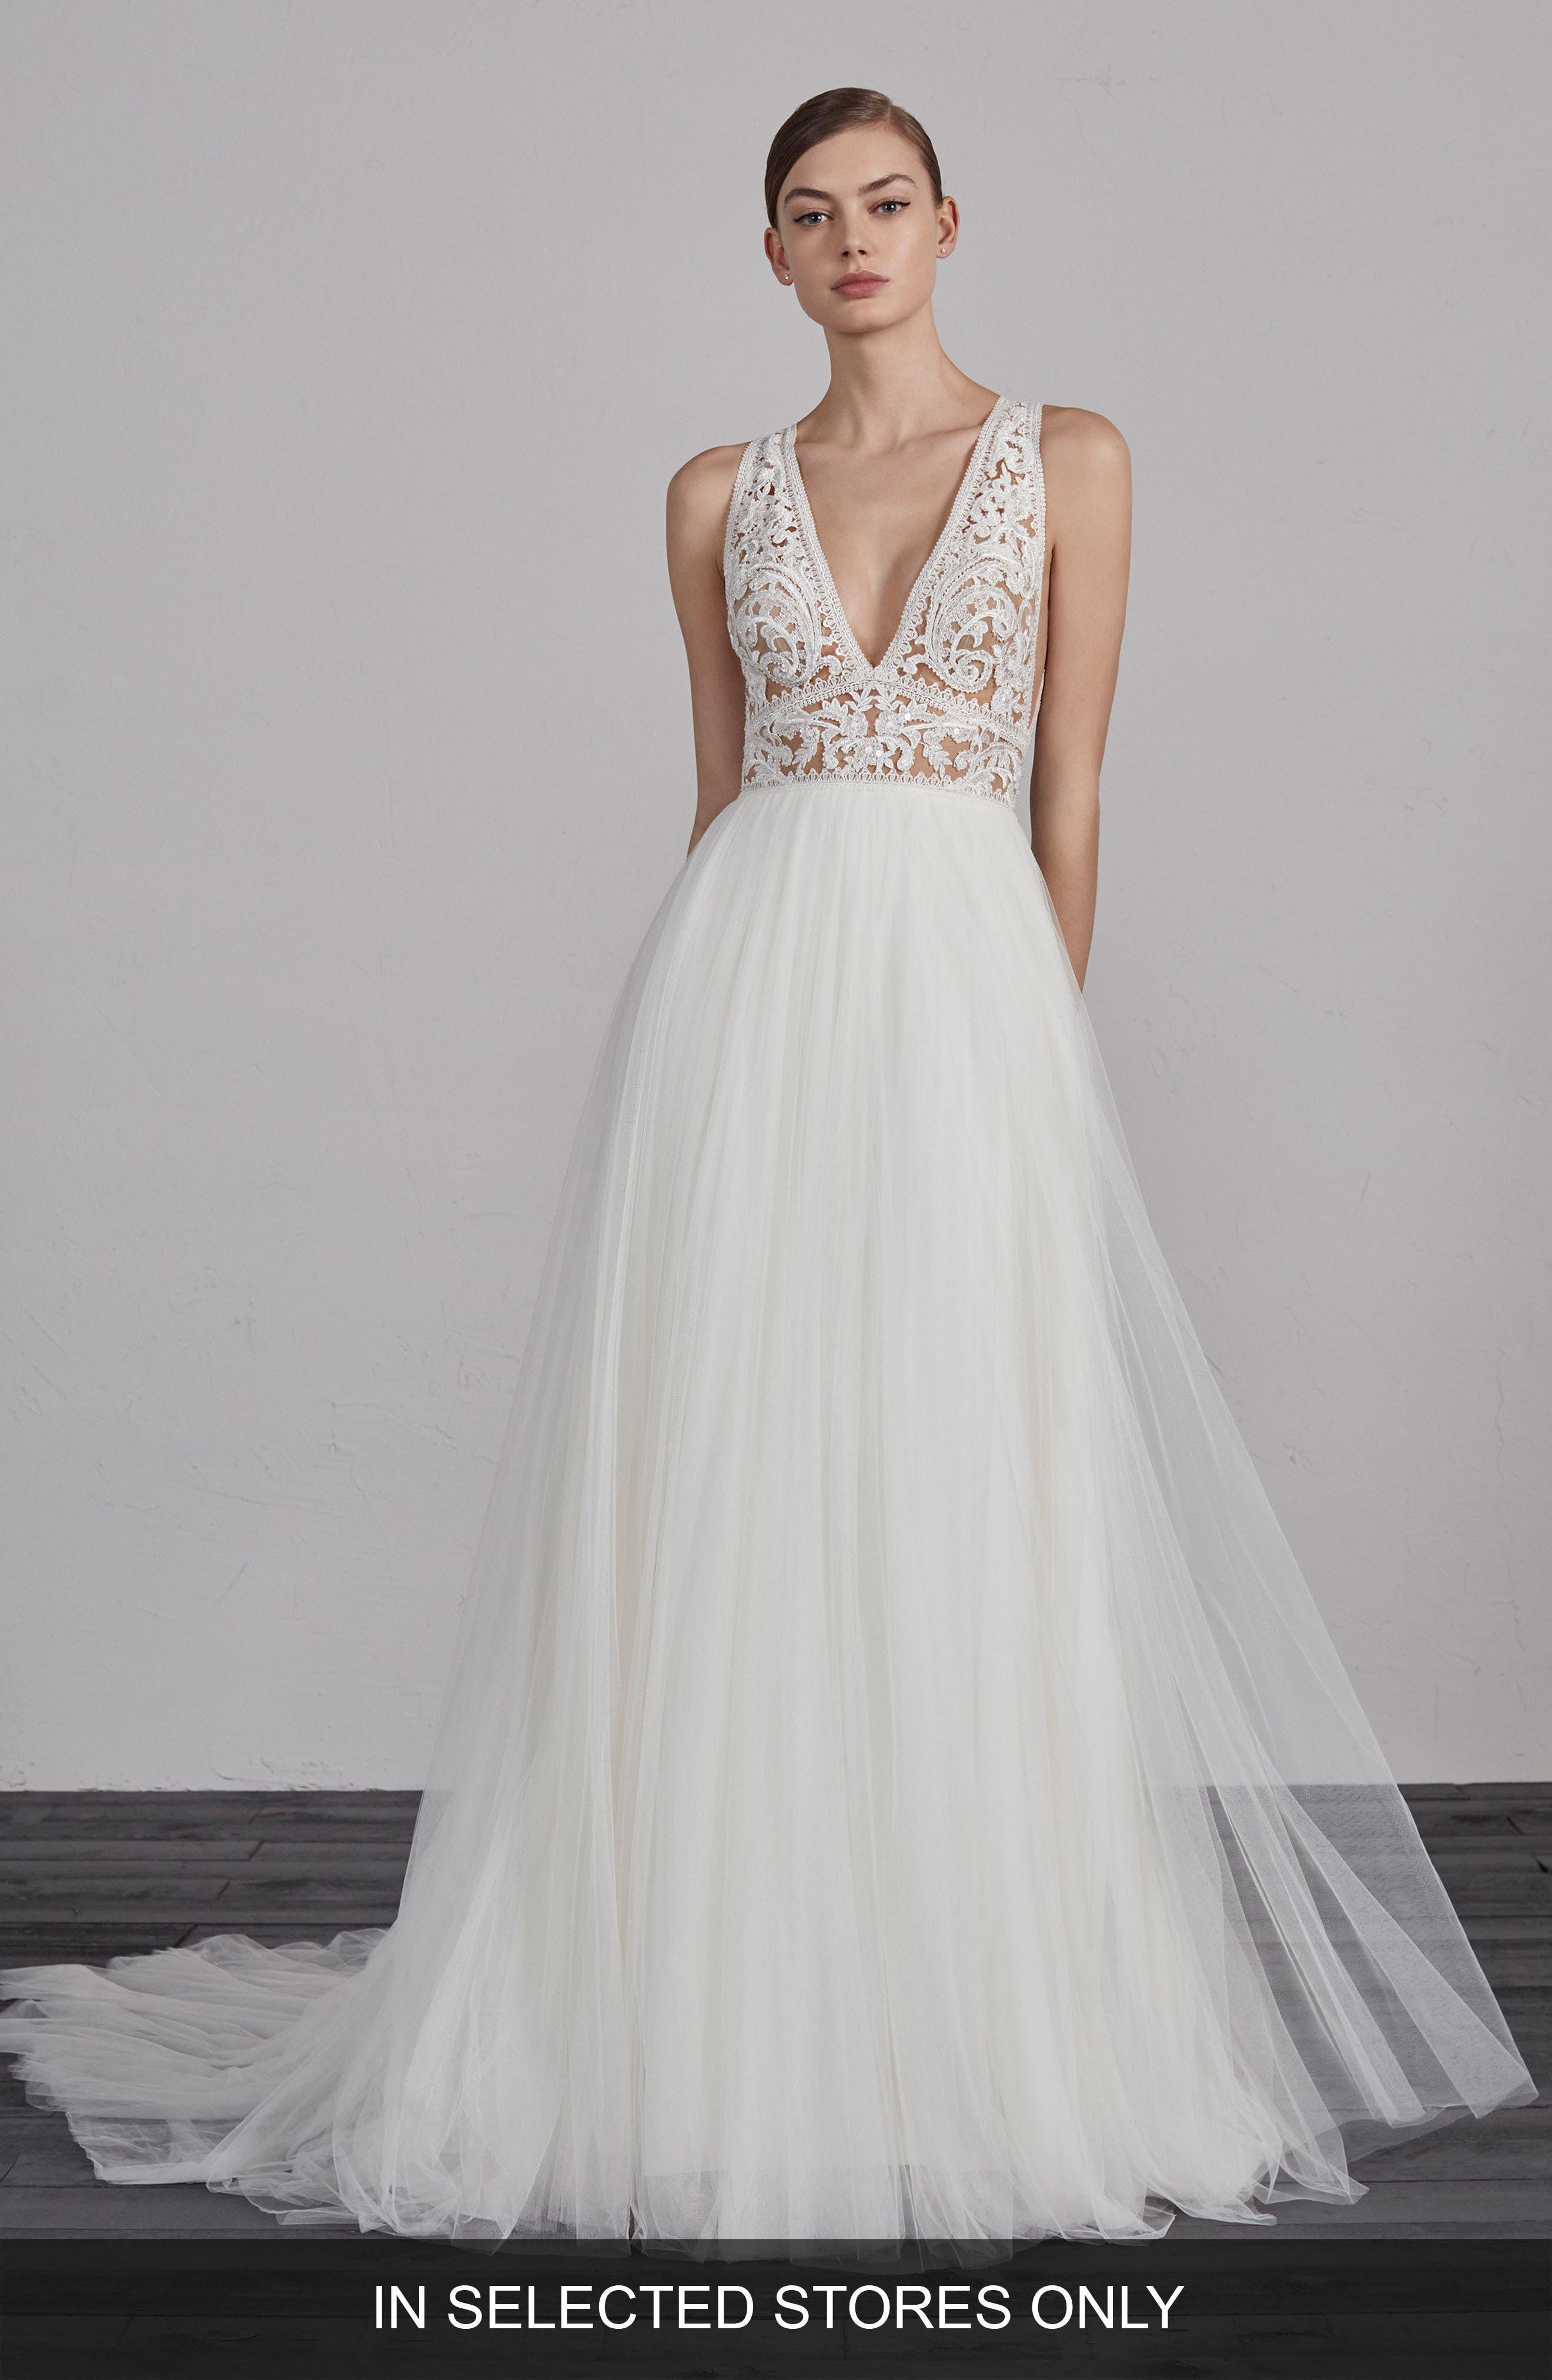 Short Skin Tight Wedding Dresses